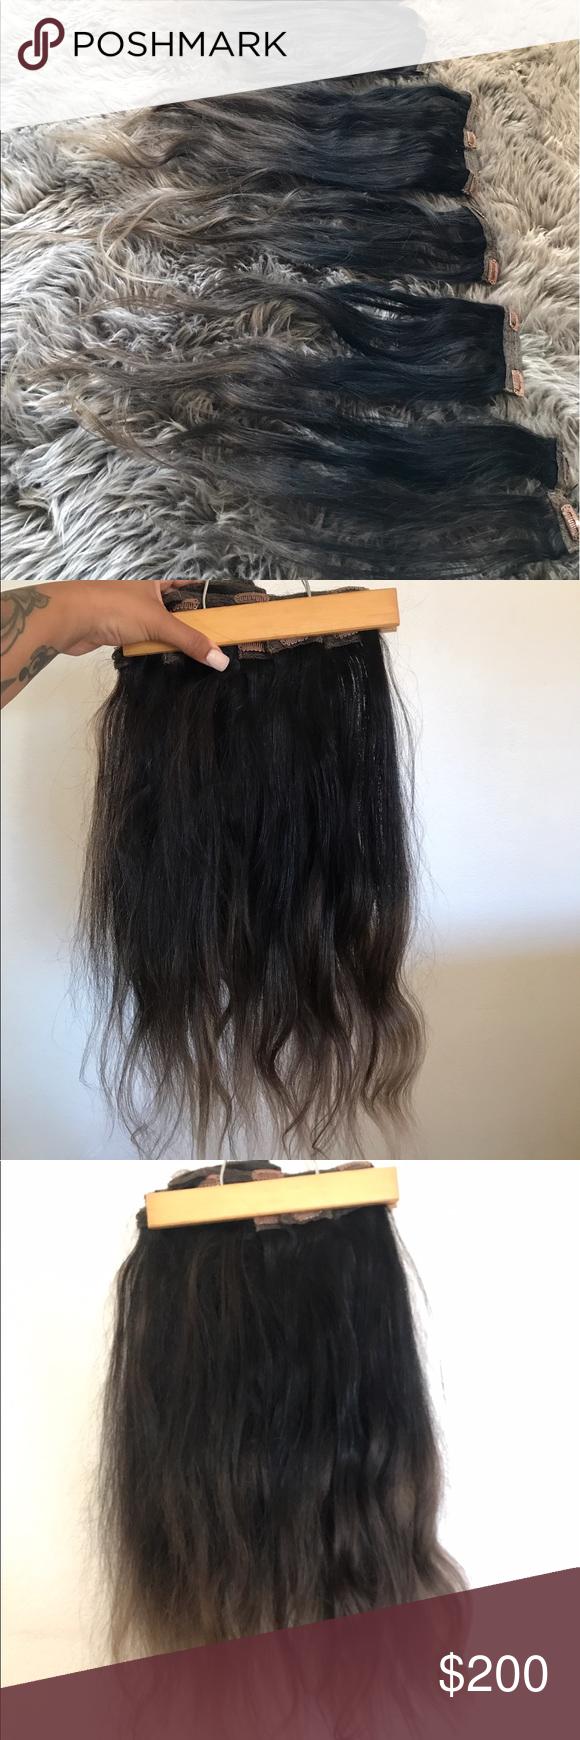 Bellami Ombre Hair Extensions